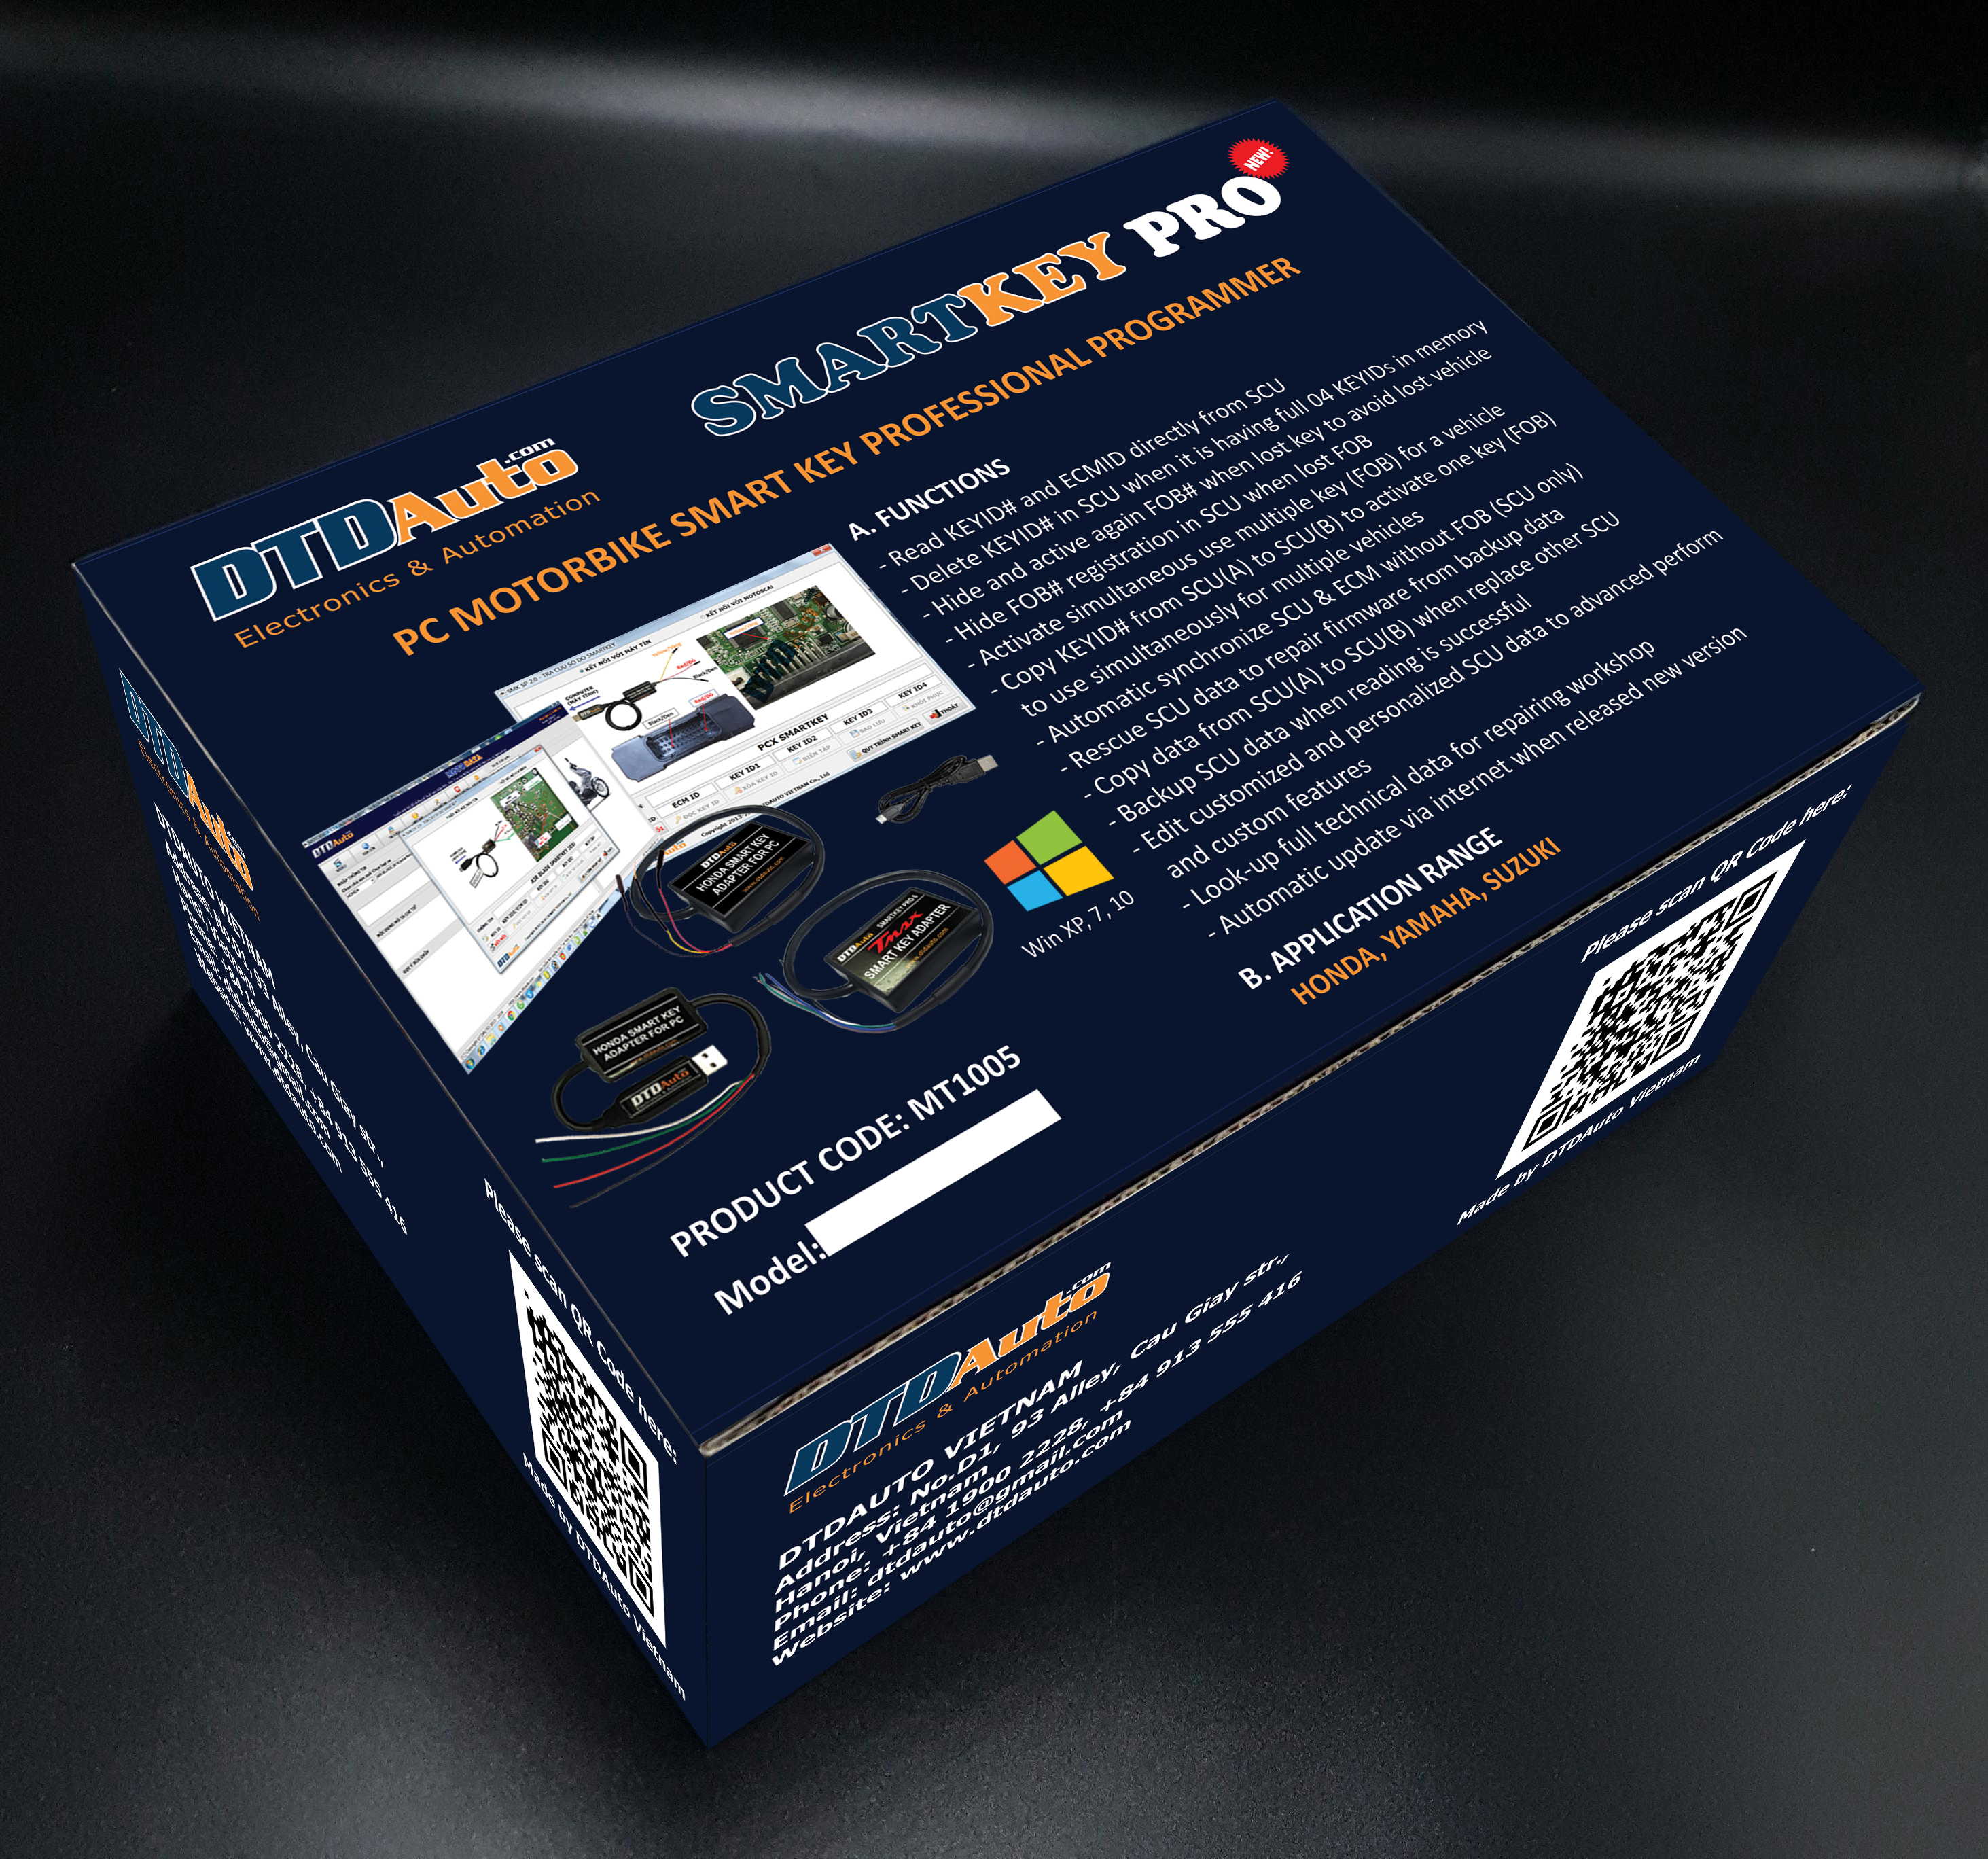 SMARTKEY PRO 7 - PC MOTORBIKE SMARTKEY PROFESSIONAL PROGRAMMER